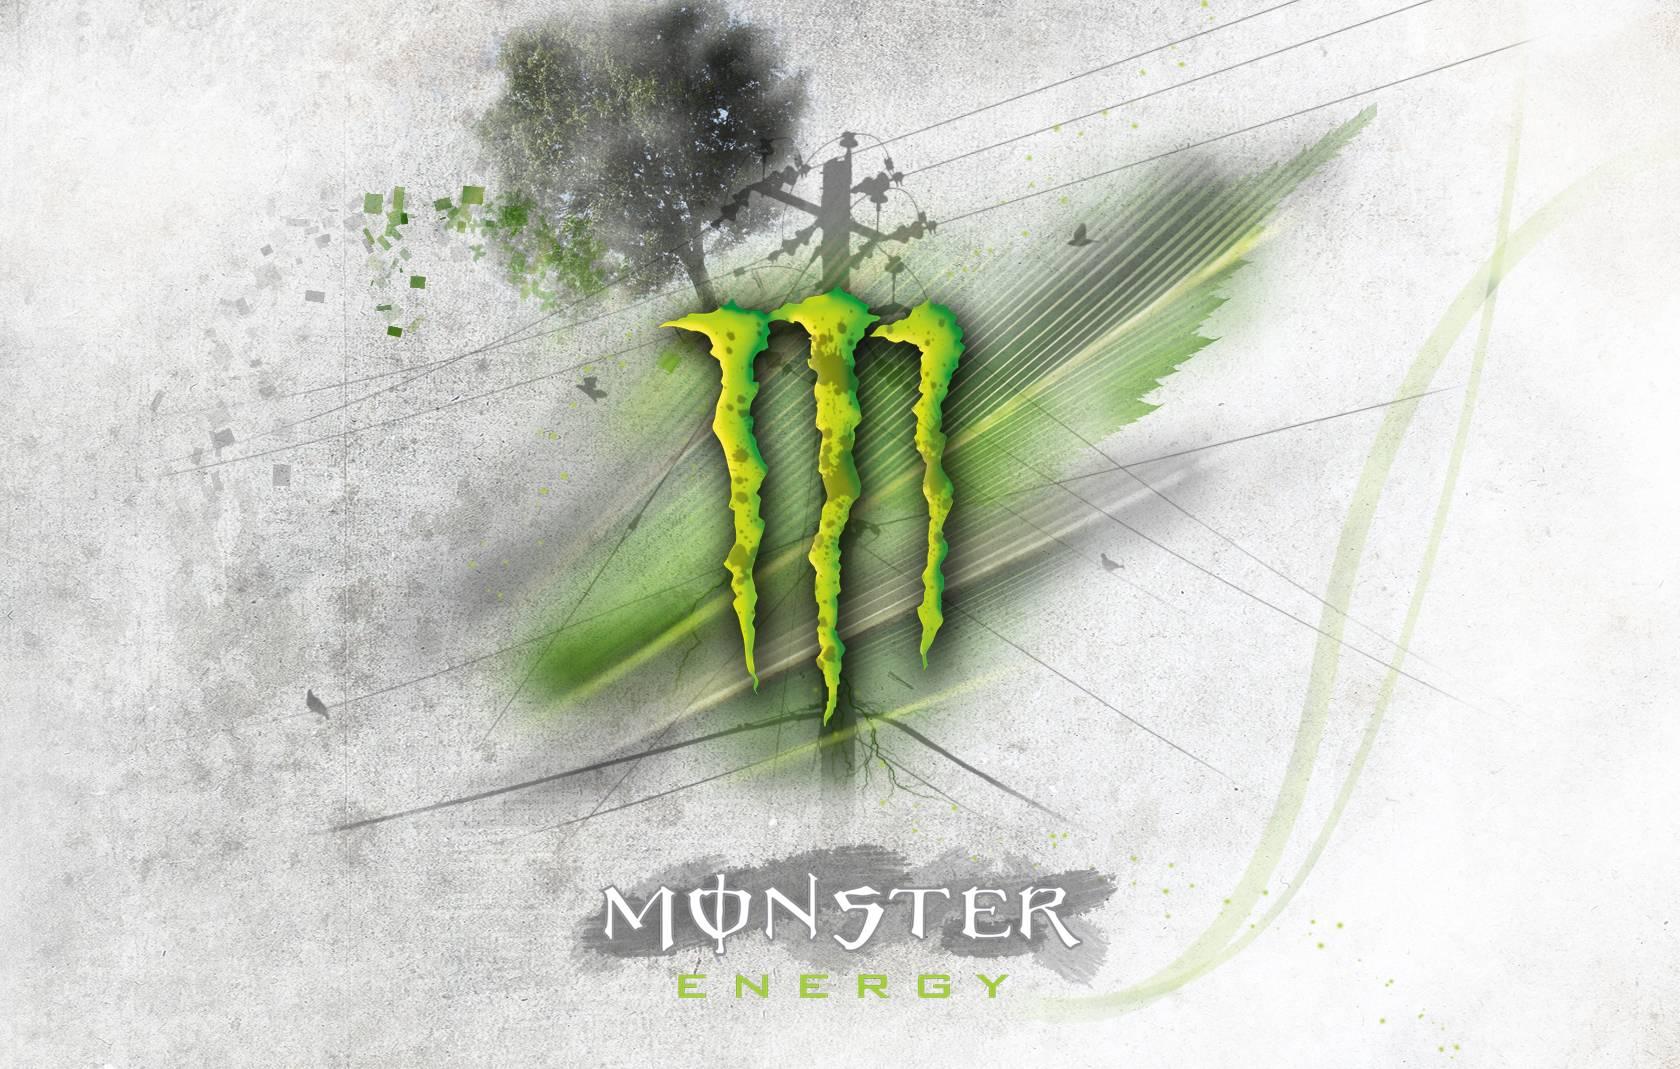 Monster Energy HD Wallpapers - HD Wallpapers Inn